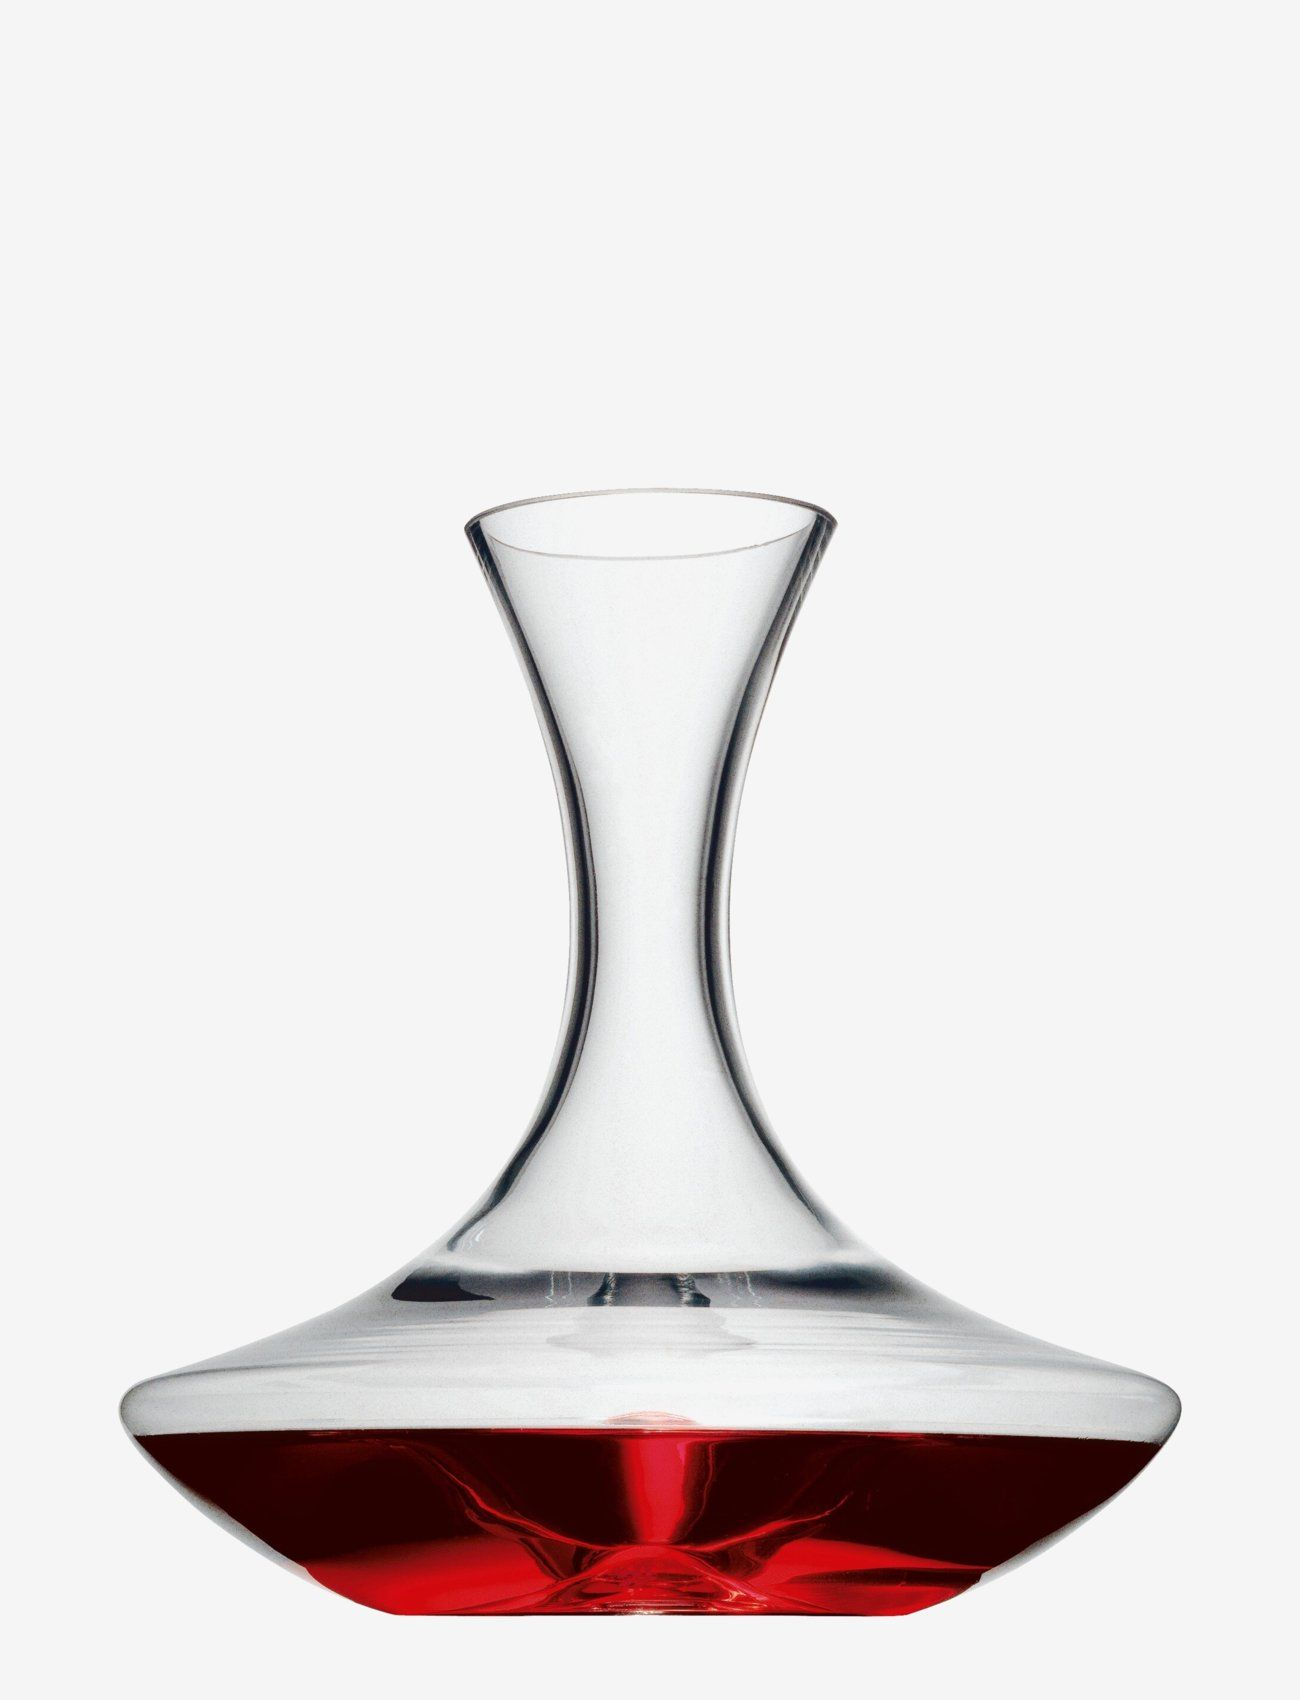 WMF - Clever & More karahvi 1,5 l. korkeus 24 cm - viinikarahvit - glass - 1